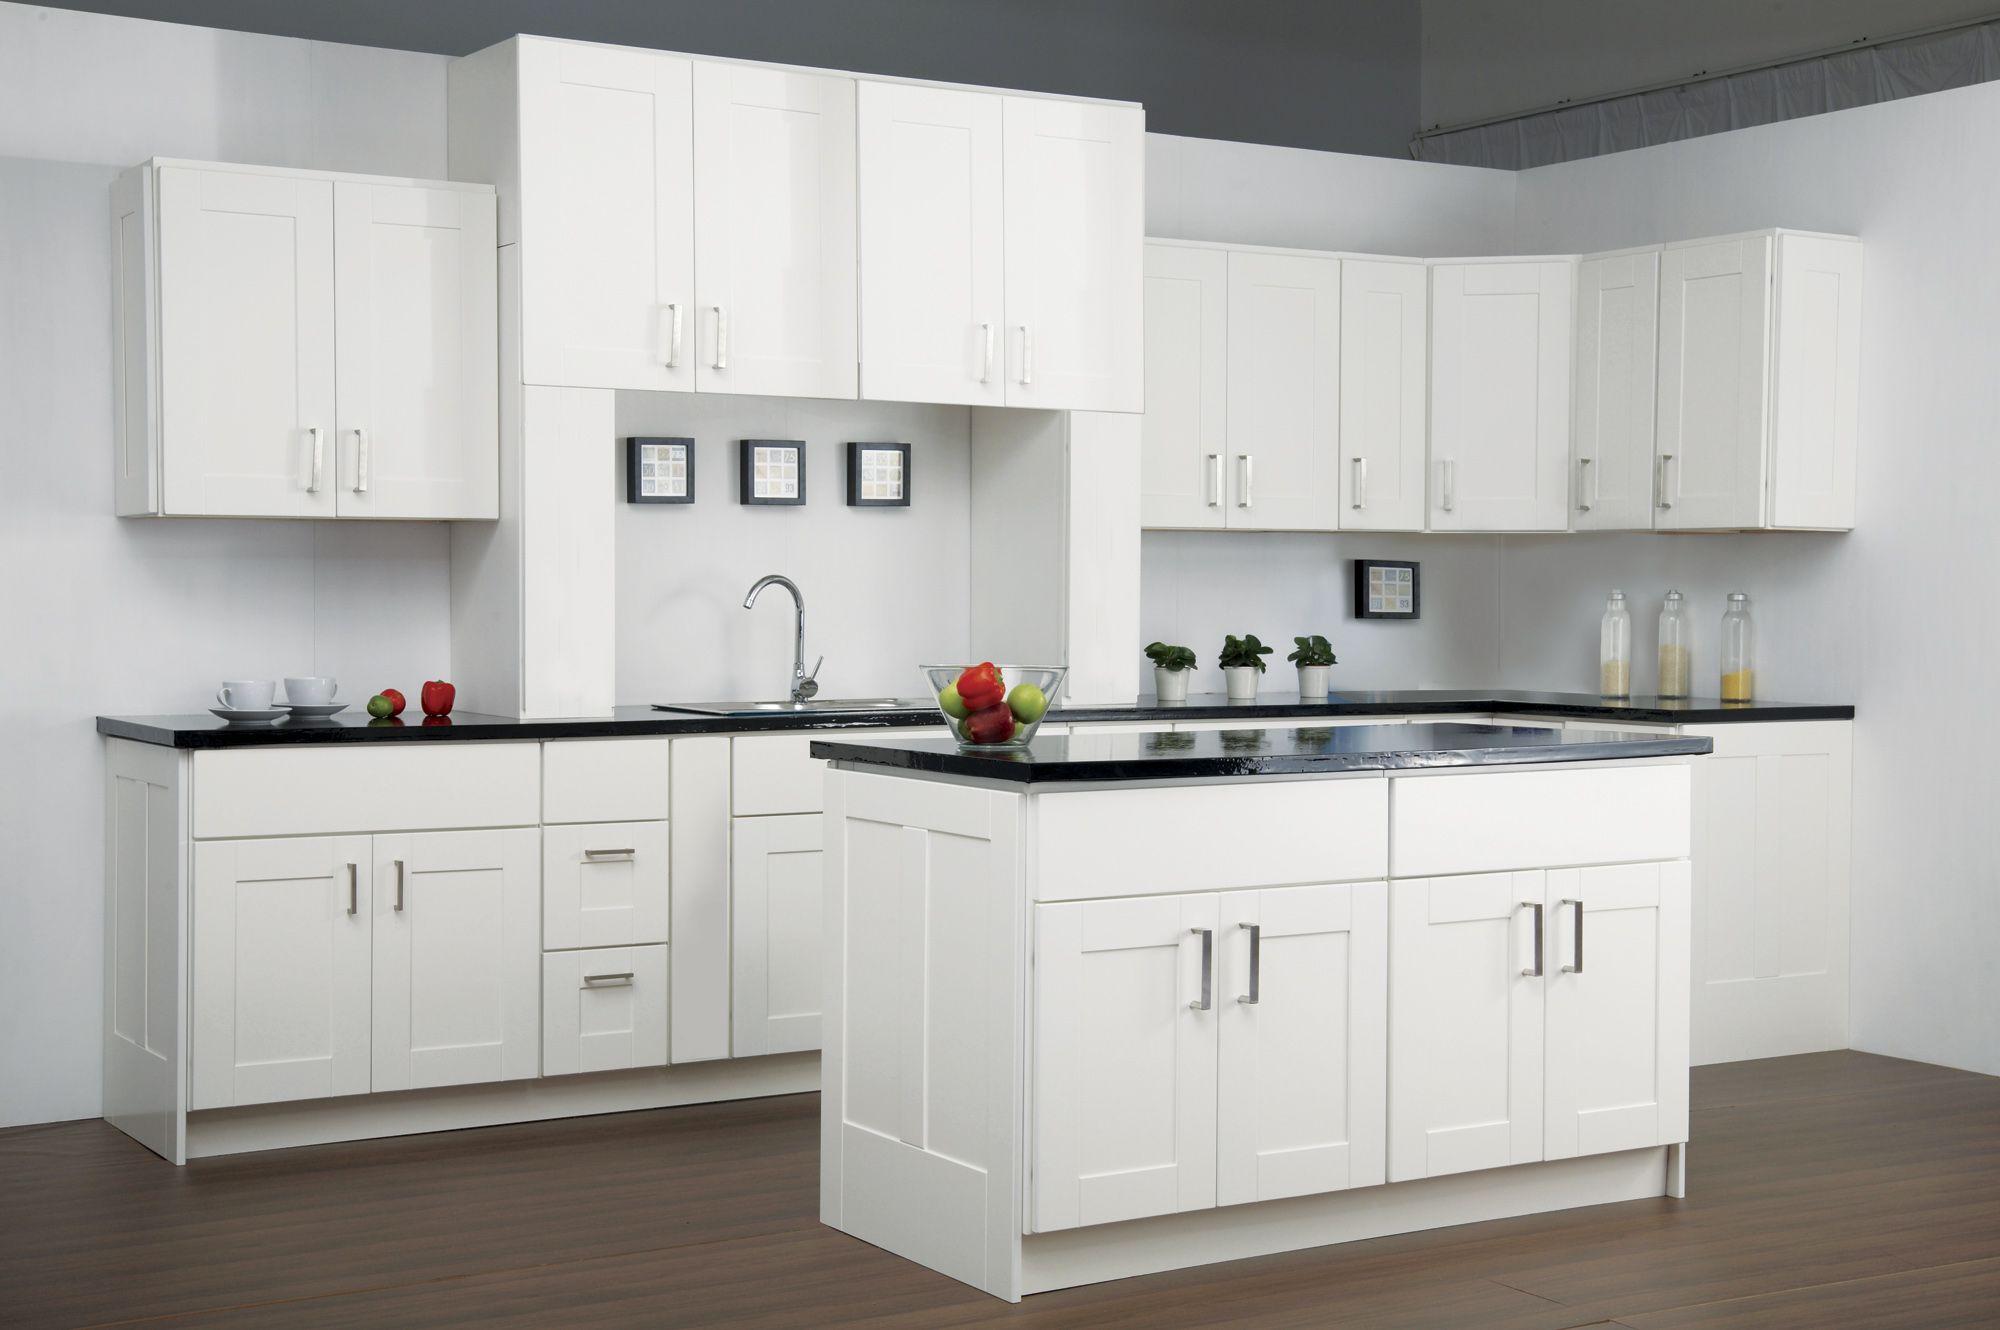 Findley & Myers Malibu White kitchen features birch hardwood doors ...